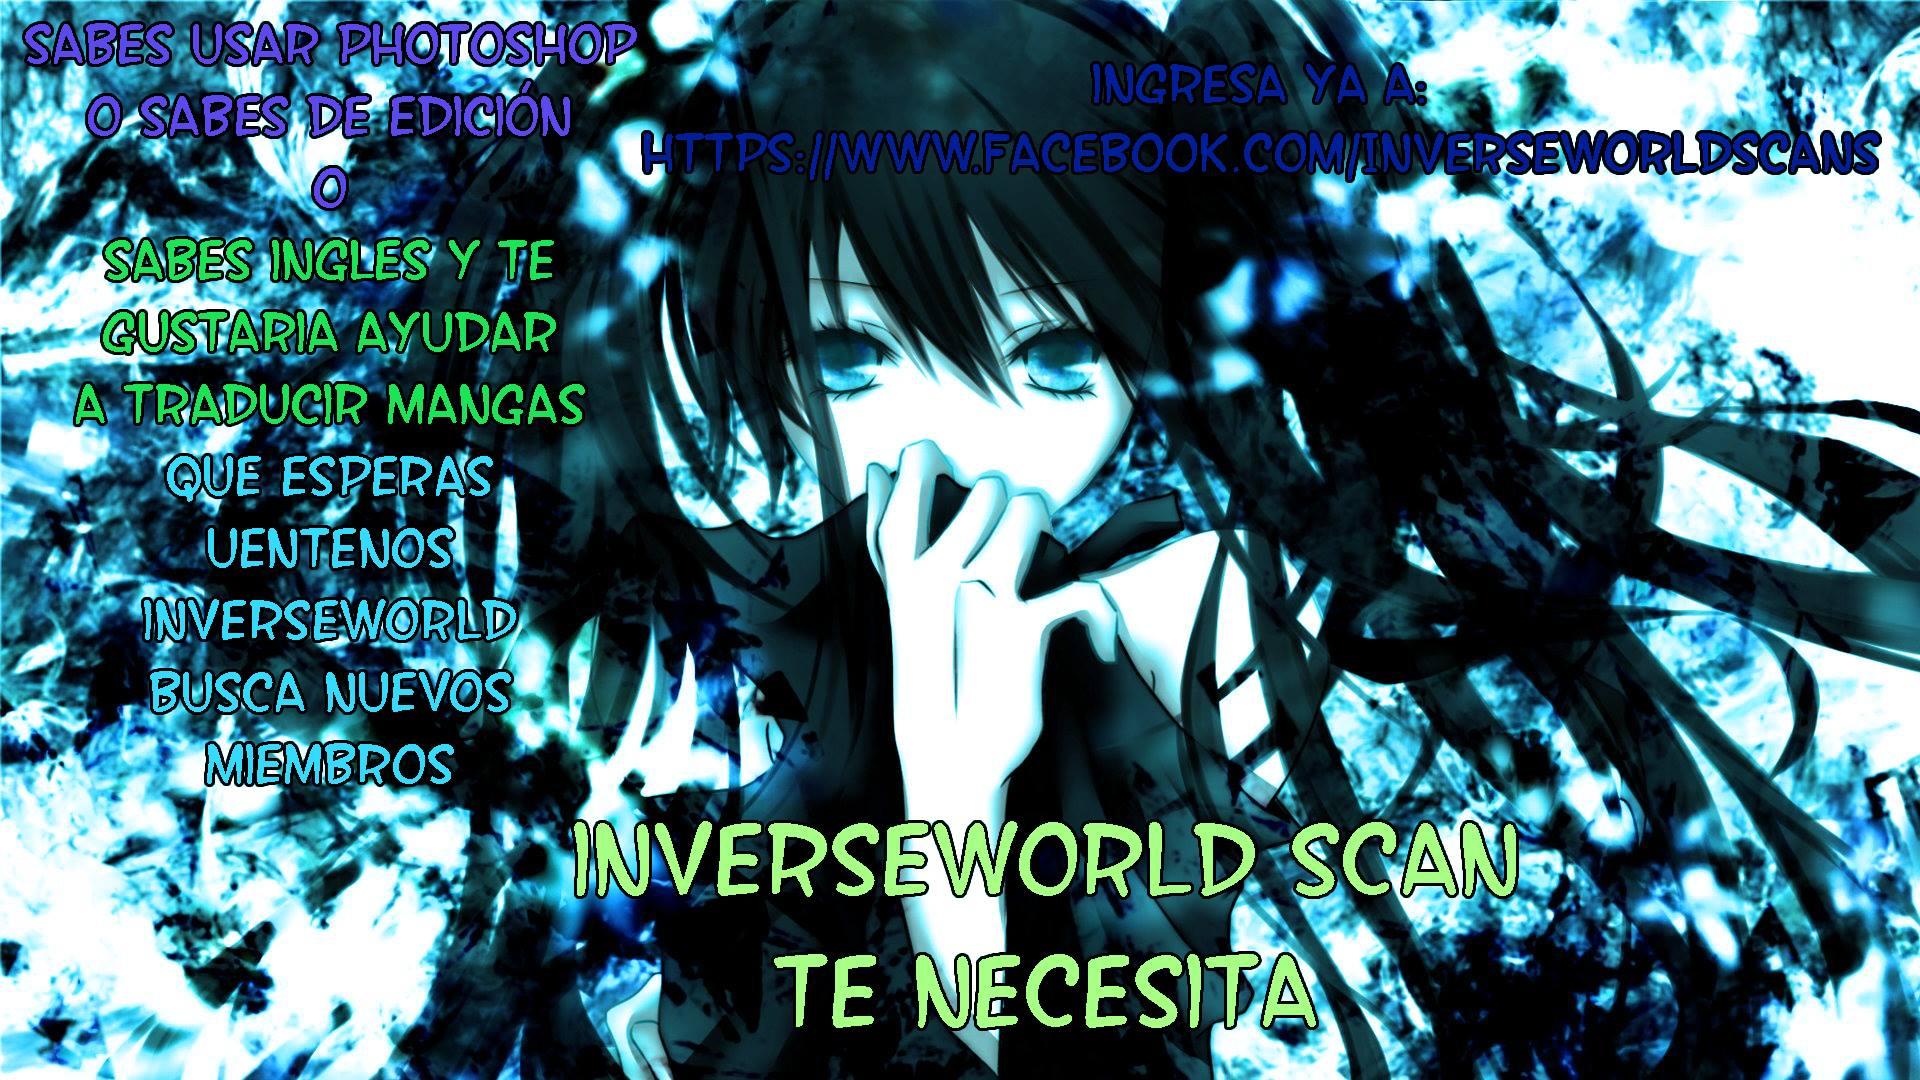 https://c5.mangatag.com/es_manga/18/16210/415307/7bff87c59e3fbc5e1ded2fe3ce1d9865.jpg Page 2